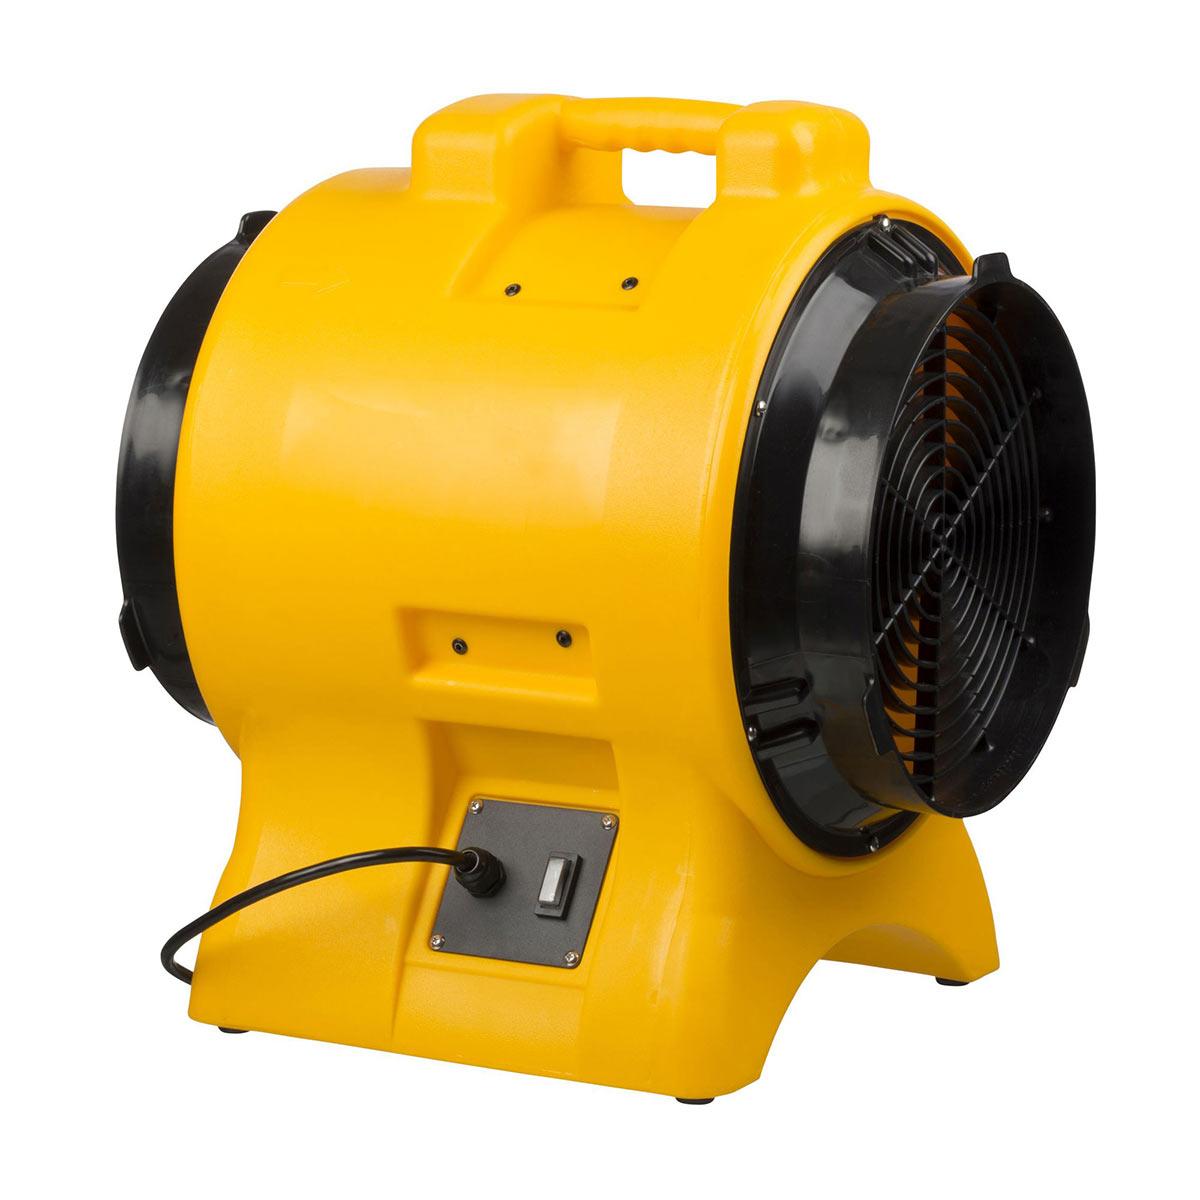 Gebläse FT BL 6800, gelb, aus Kunststoff, gelb, 3500 m3/h, 0.75 kW, D: 290 mm